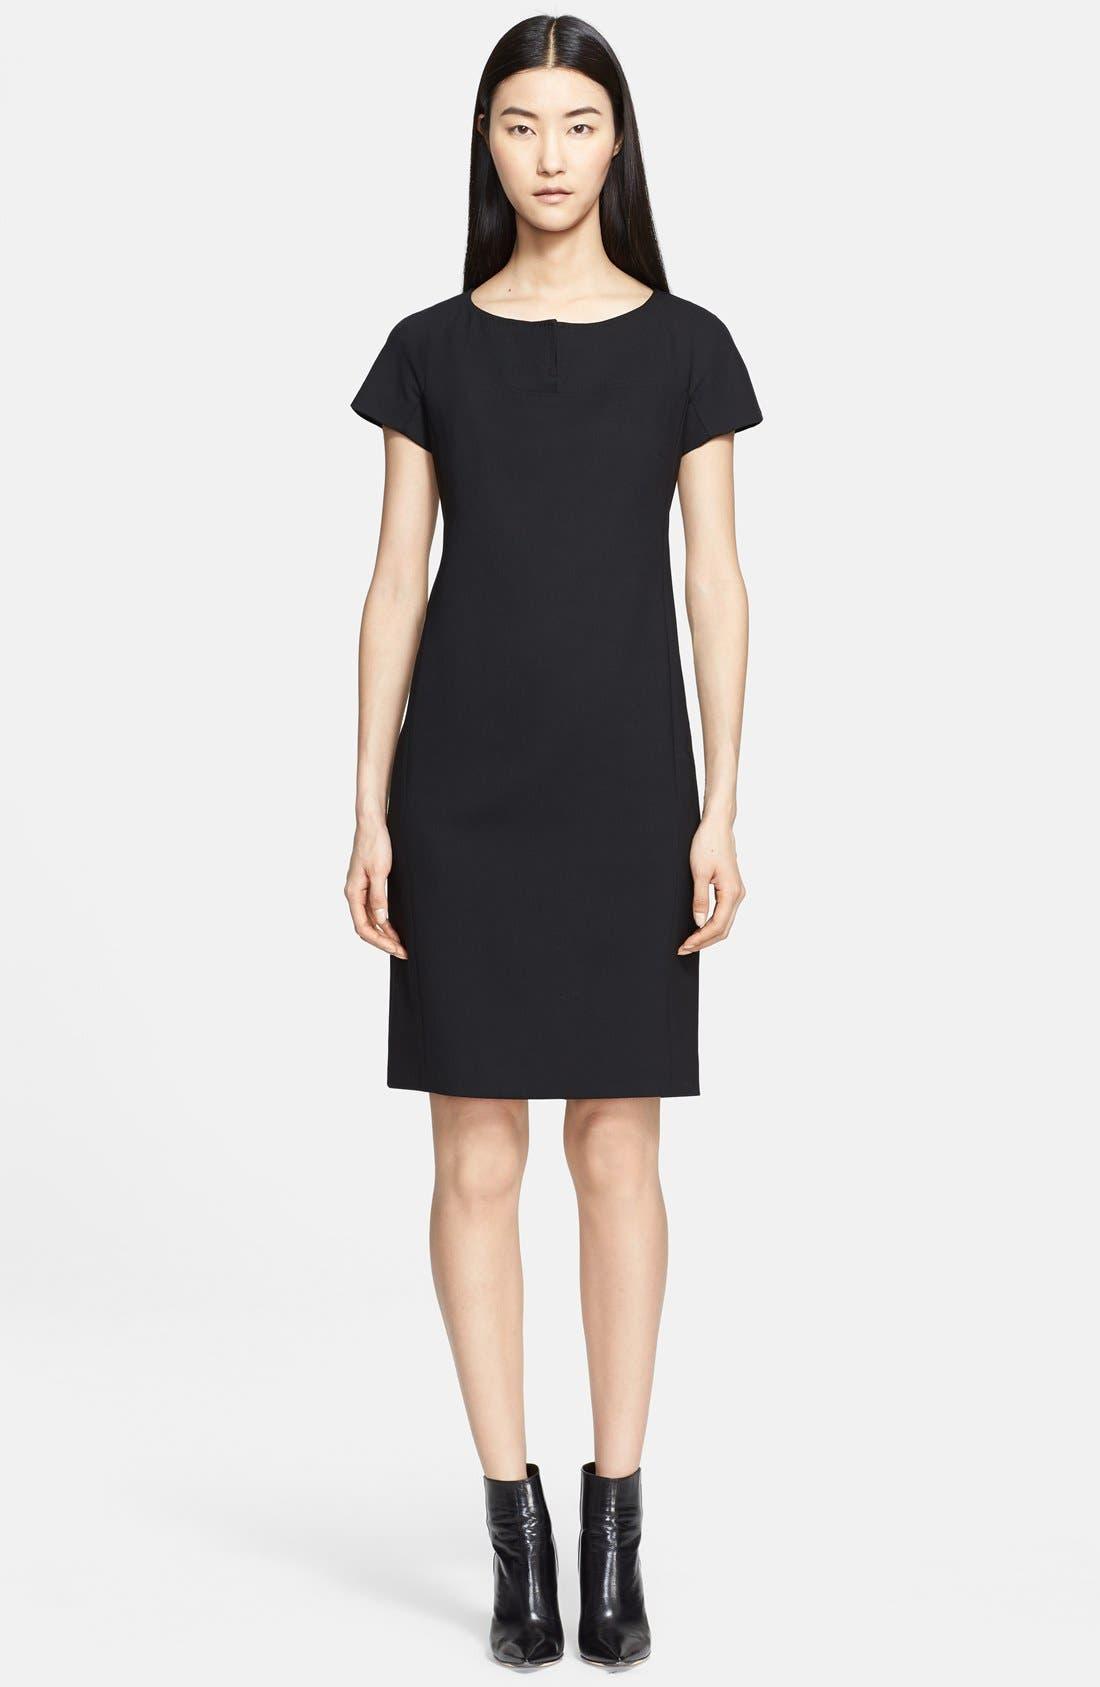 Alternate Image 1 Selected - Max Mara 'Fiamma' Wool Crepe Dress